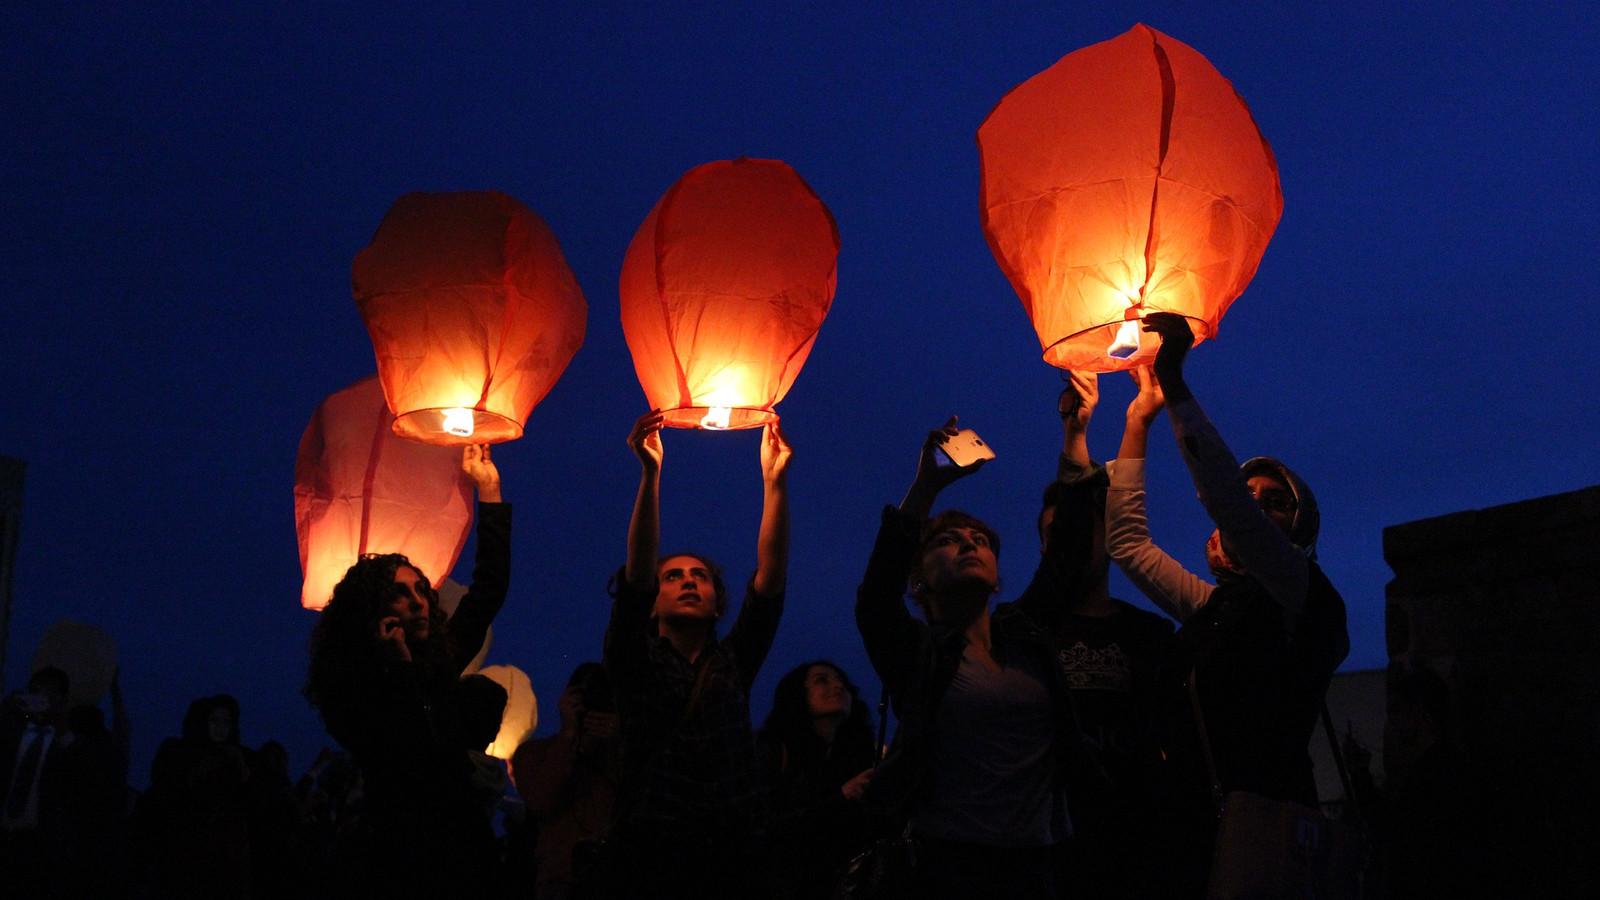 Wensballonnen kunnen natuurbranden veroorzaken.